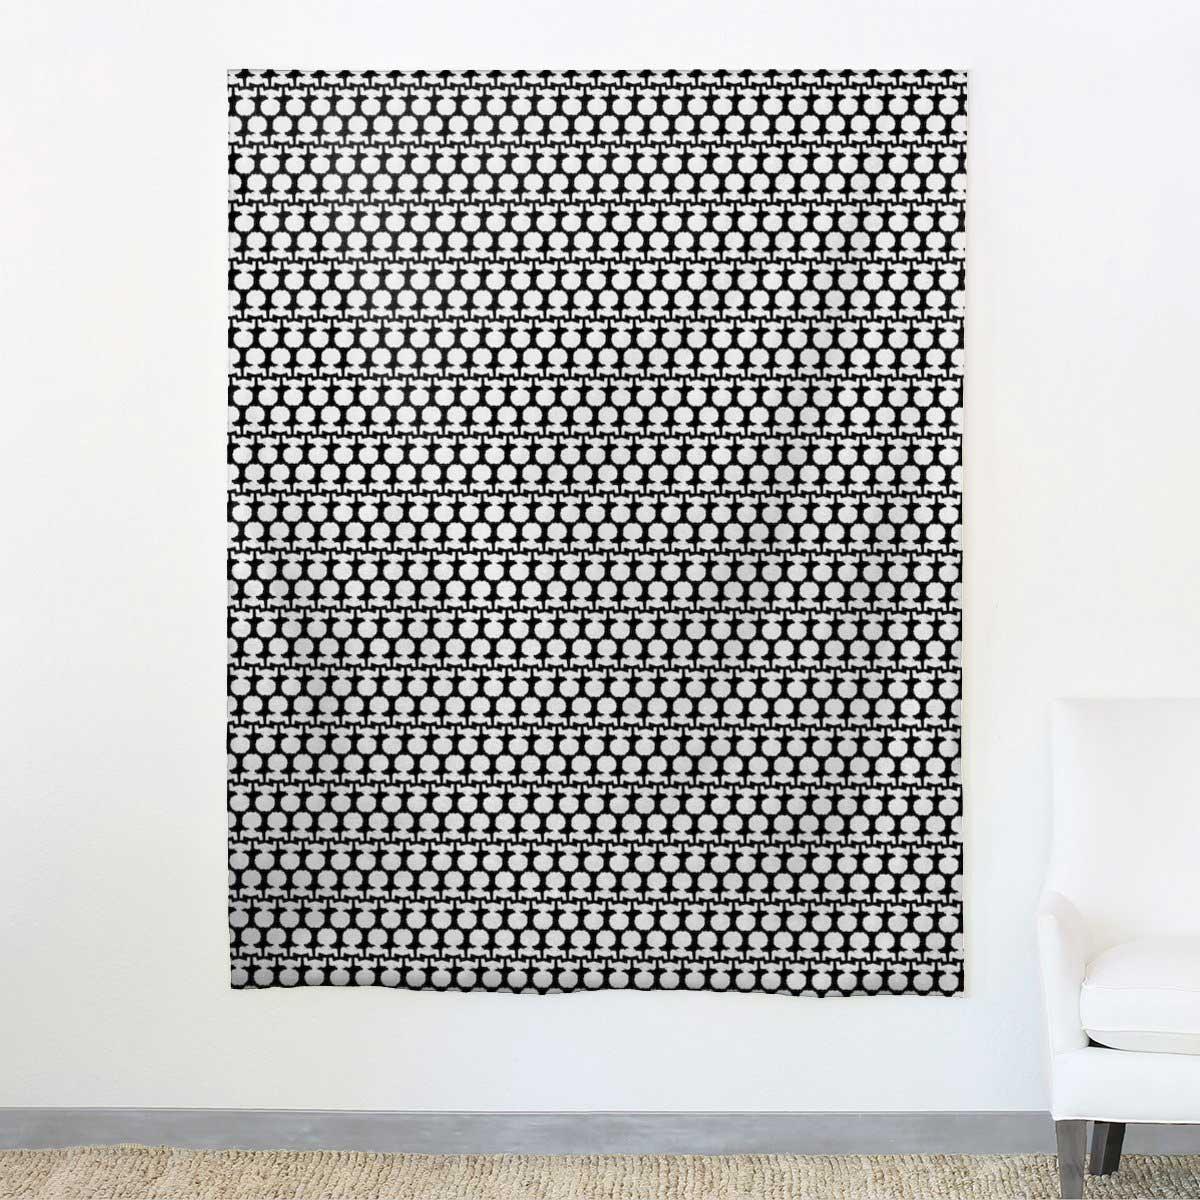 AphroChic Silhouette Petite Fabric in Black and White